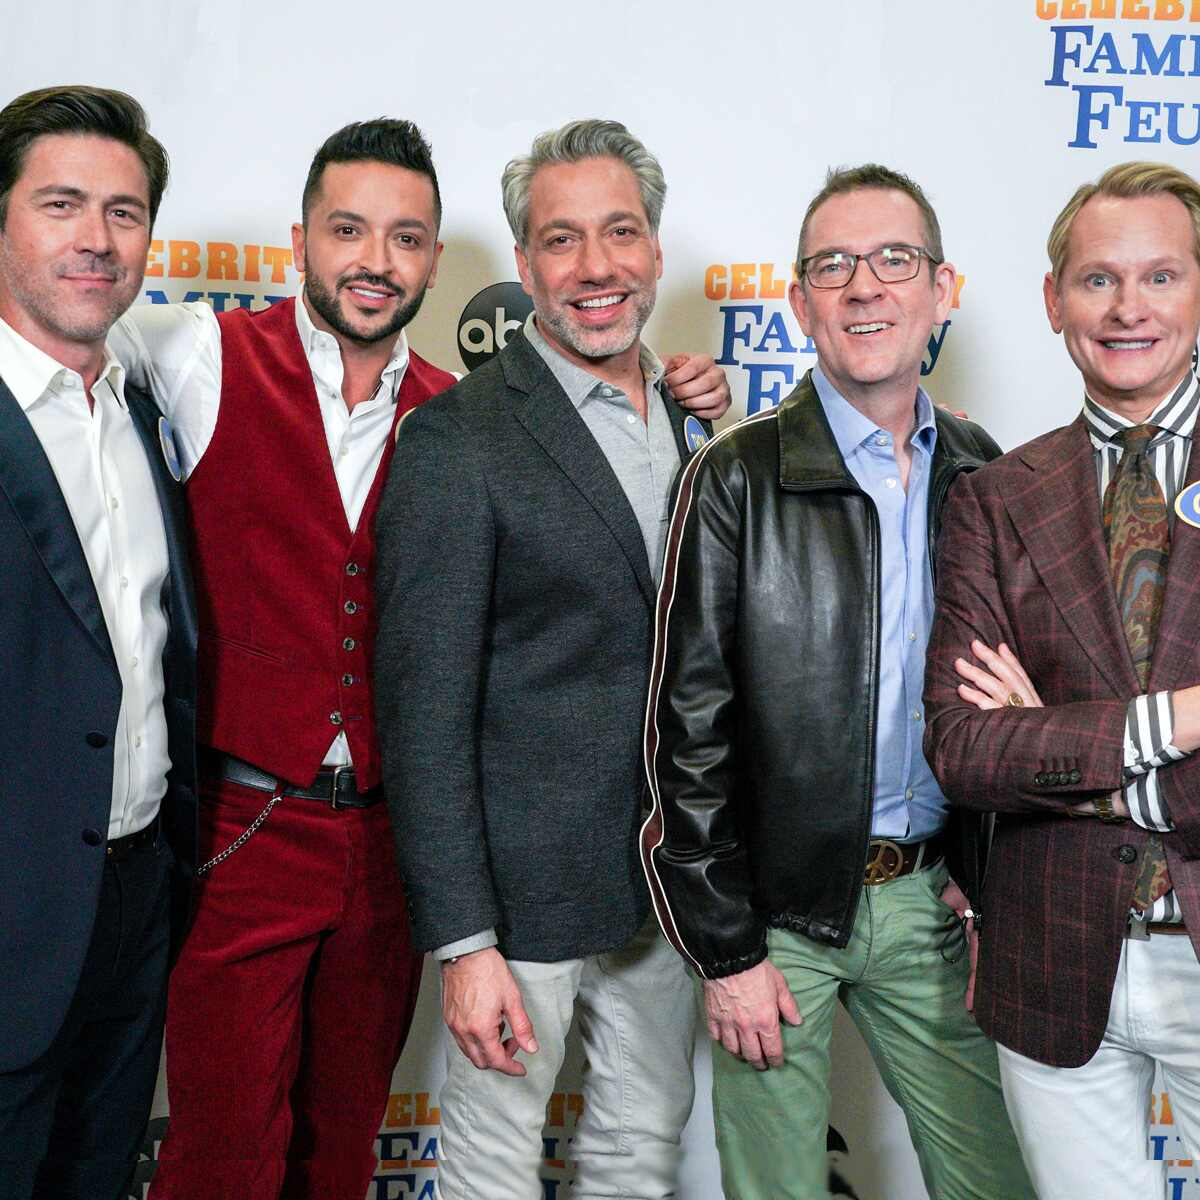 Queer Eye original cast, Kyan Douglas, Jai Rodriguez, Thom Filicia, Ted Allen, Carson Kressley